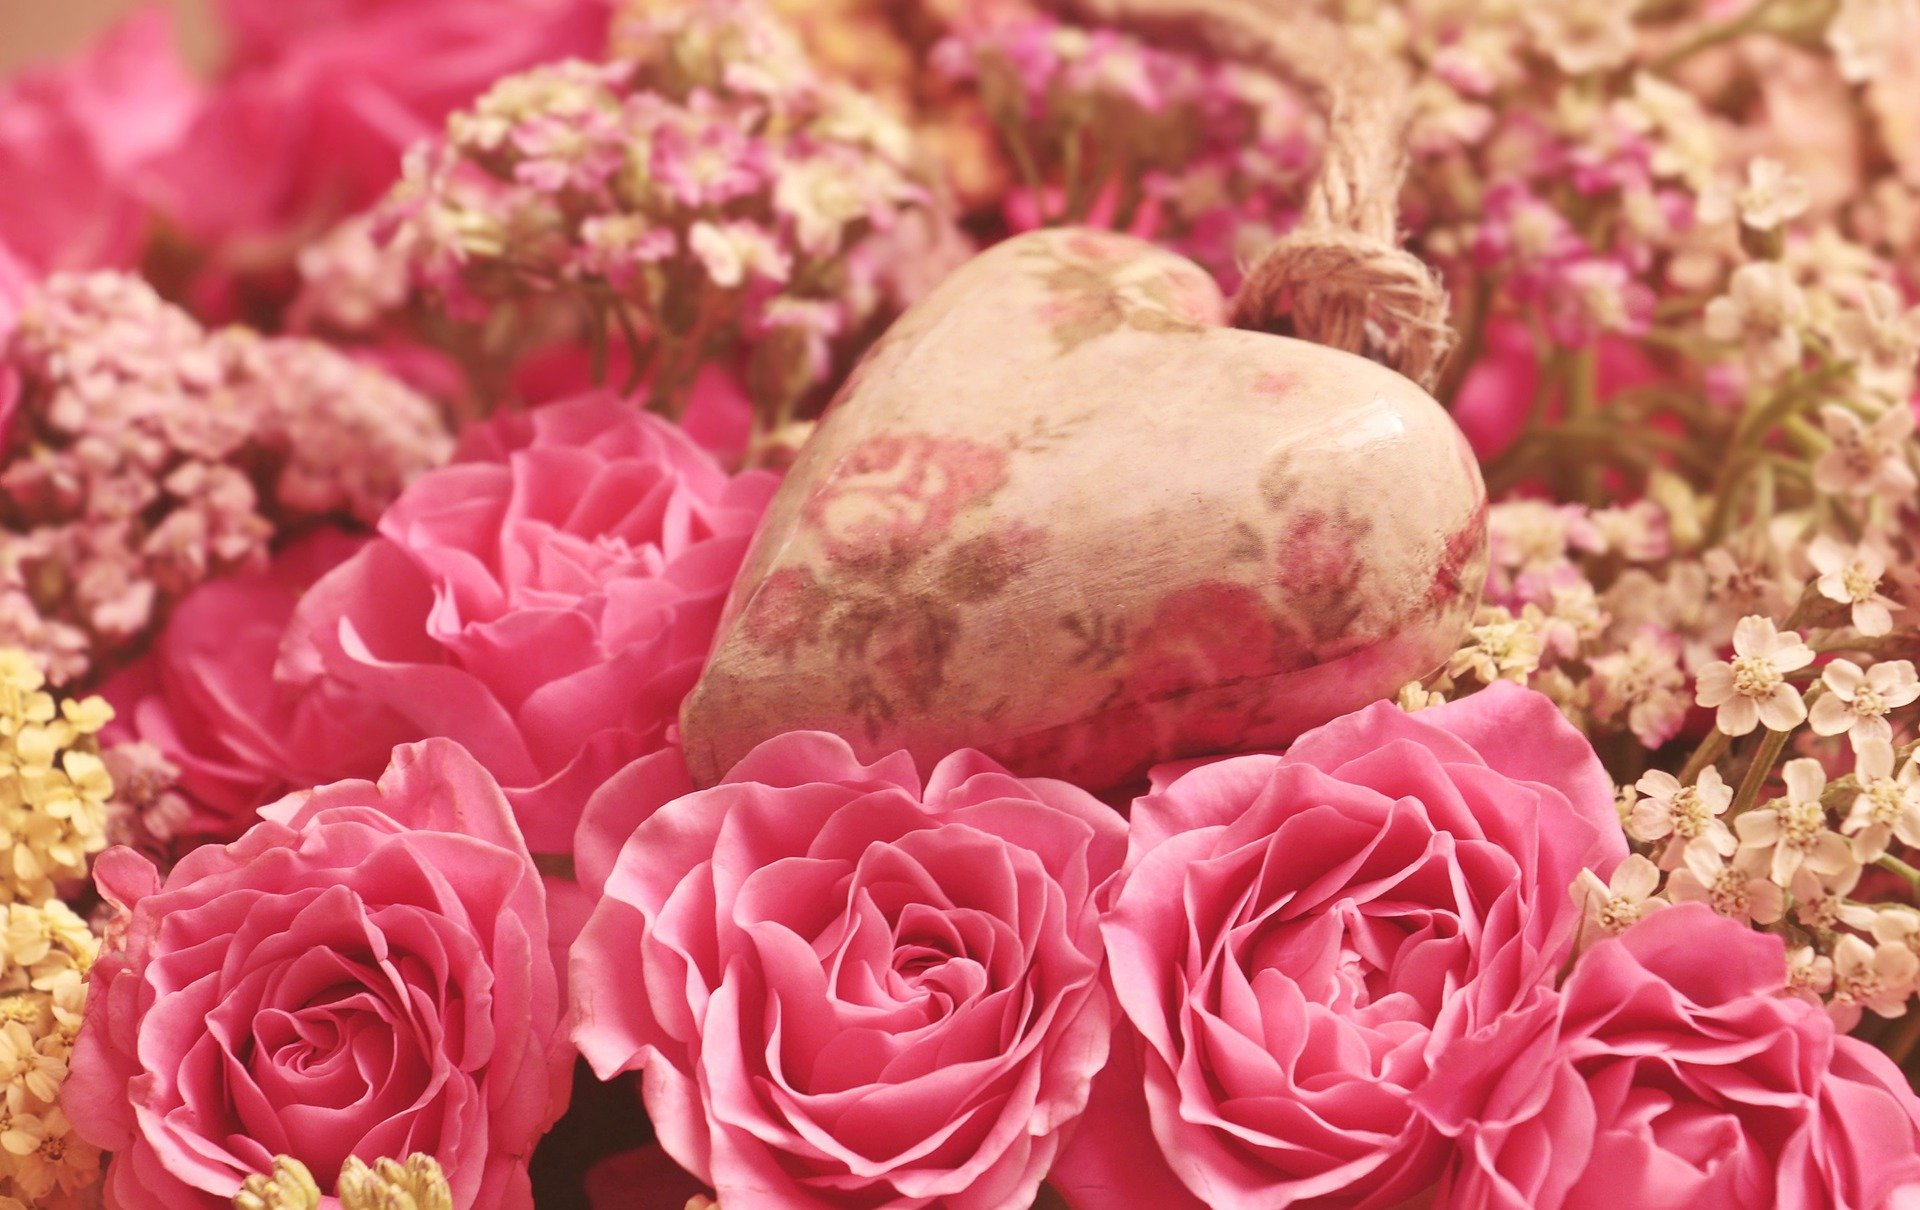 http://www.althea-fleurs.com/wp-content/uploads/2020/01/roses-3699995_1920-1.jpg